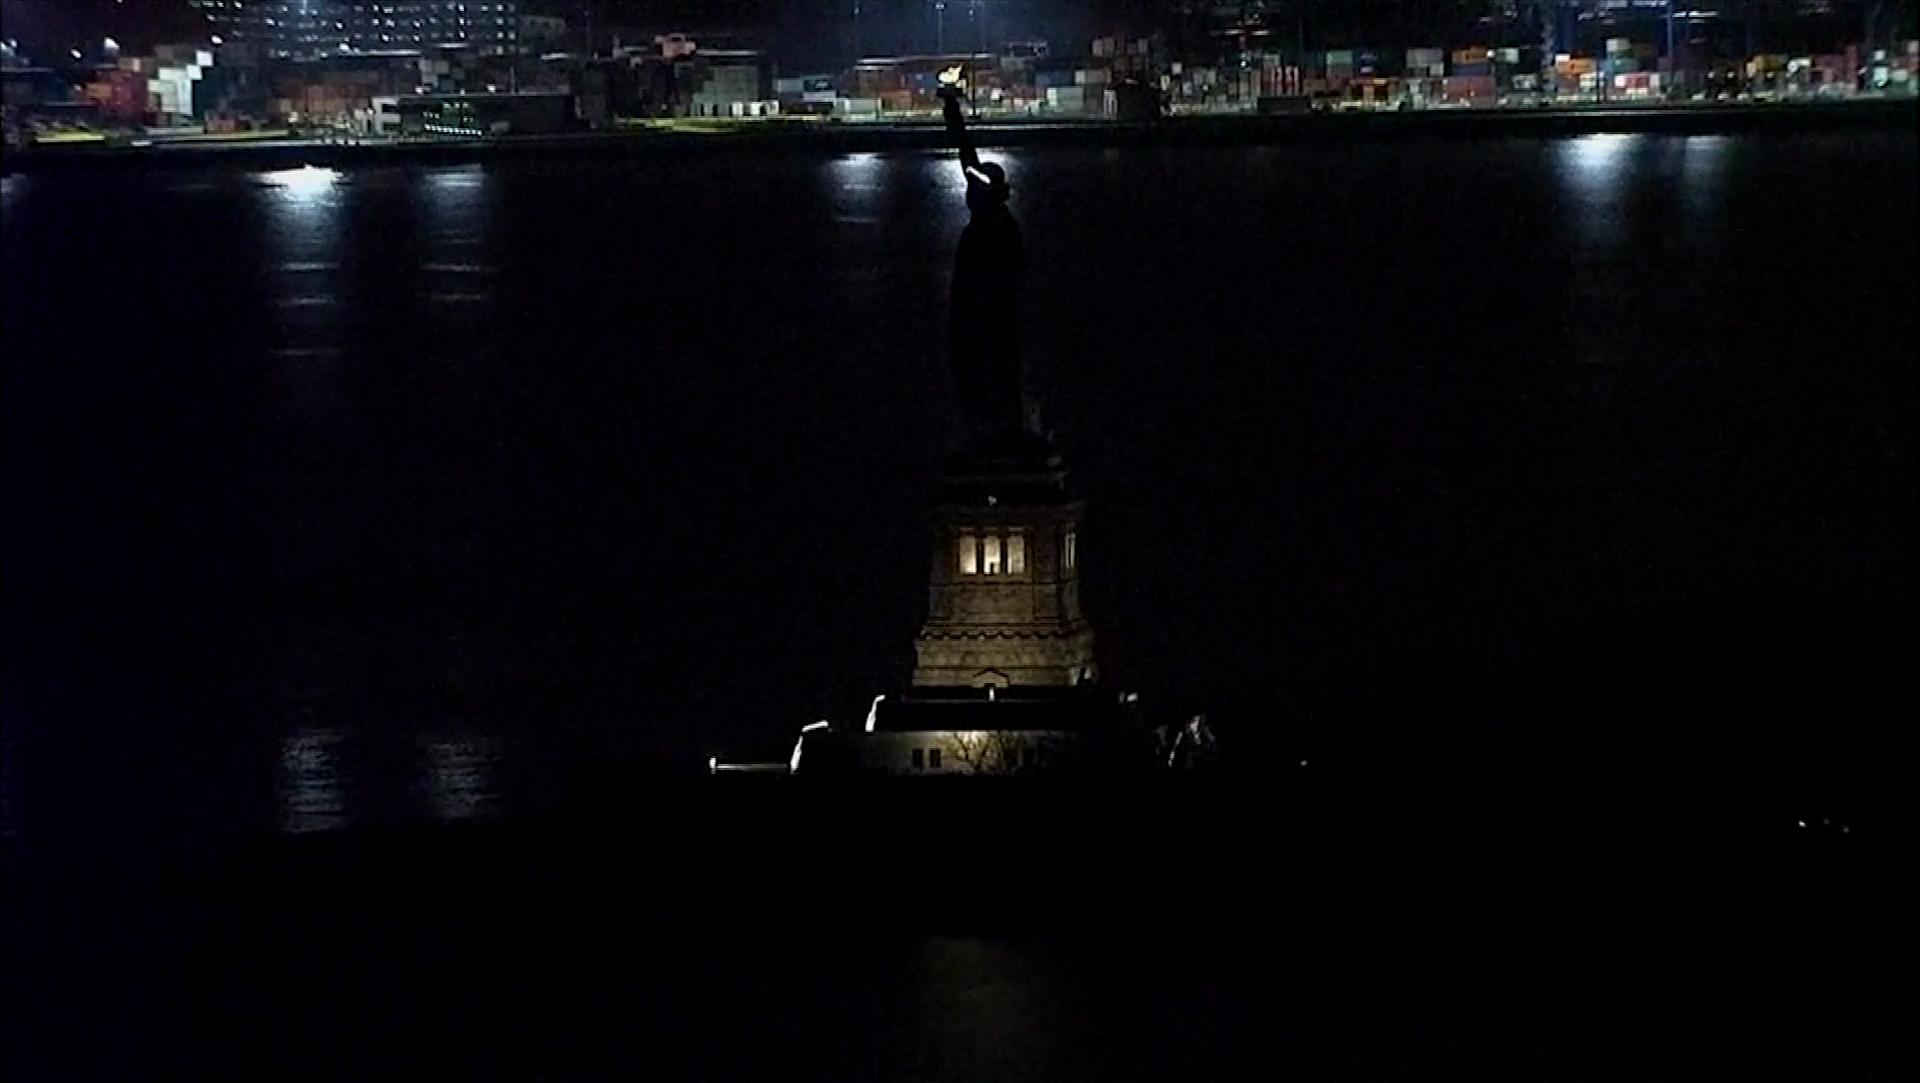 Statue of Liberty dark